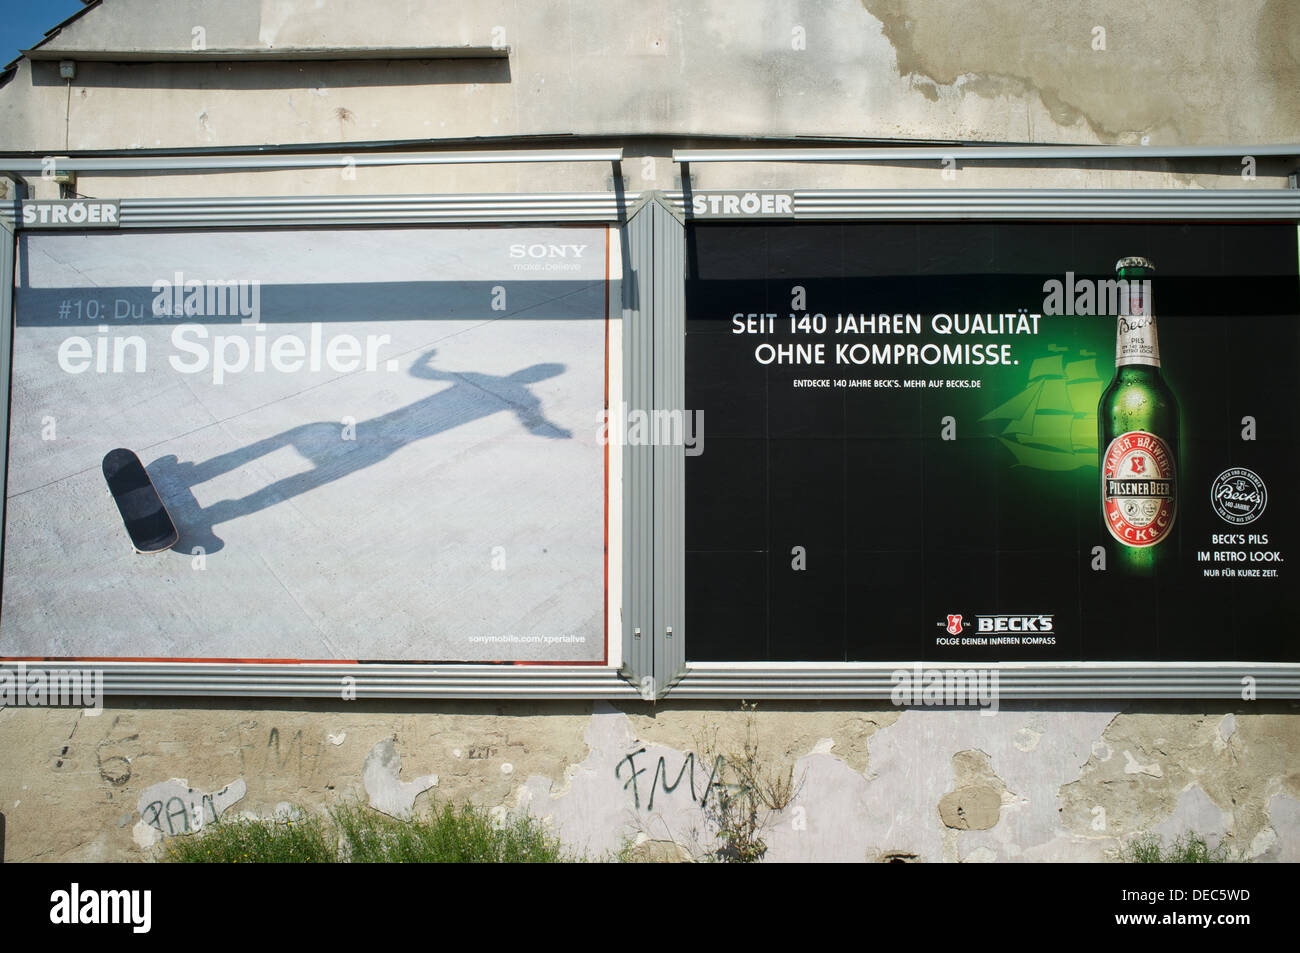 Advertising billboard - Stock Image